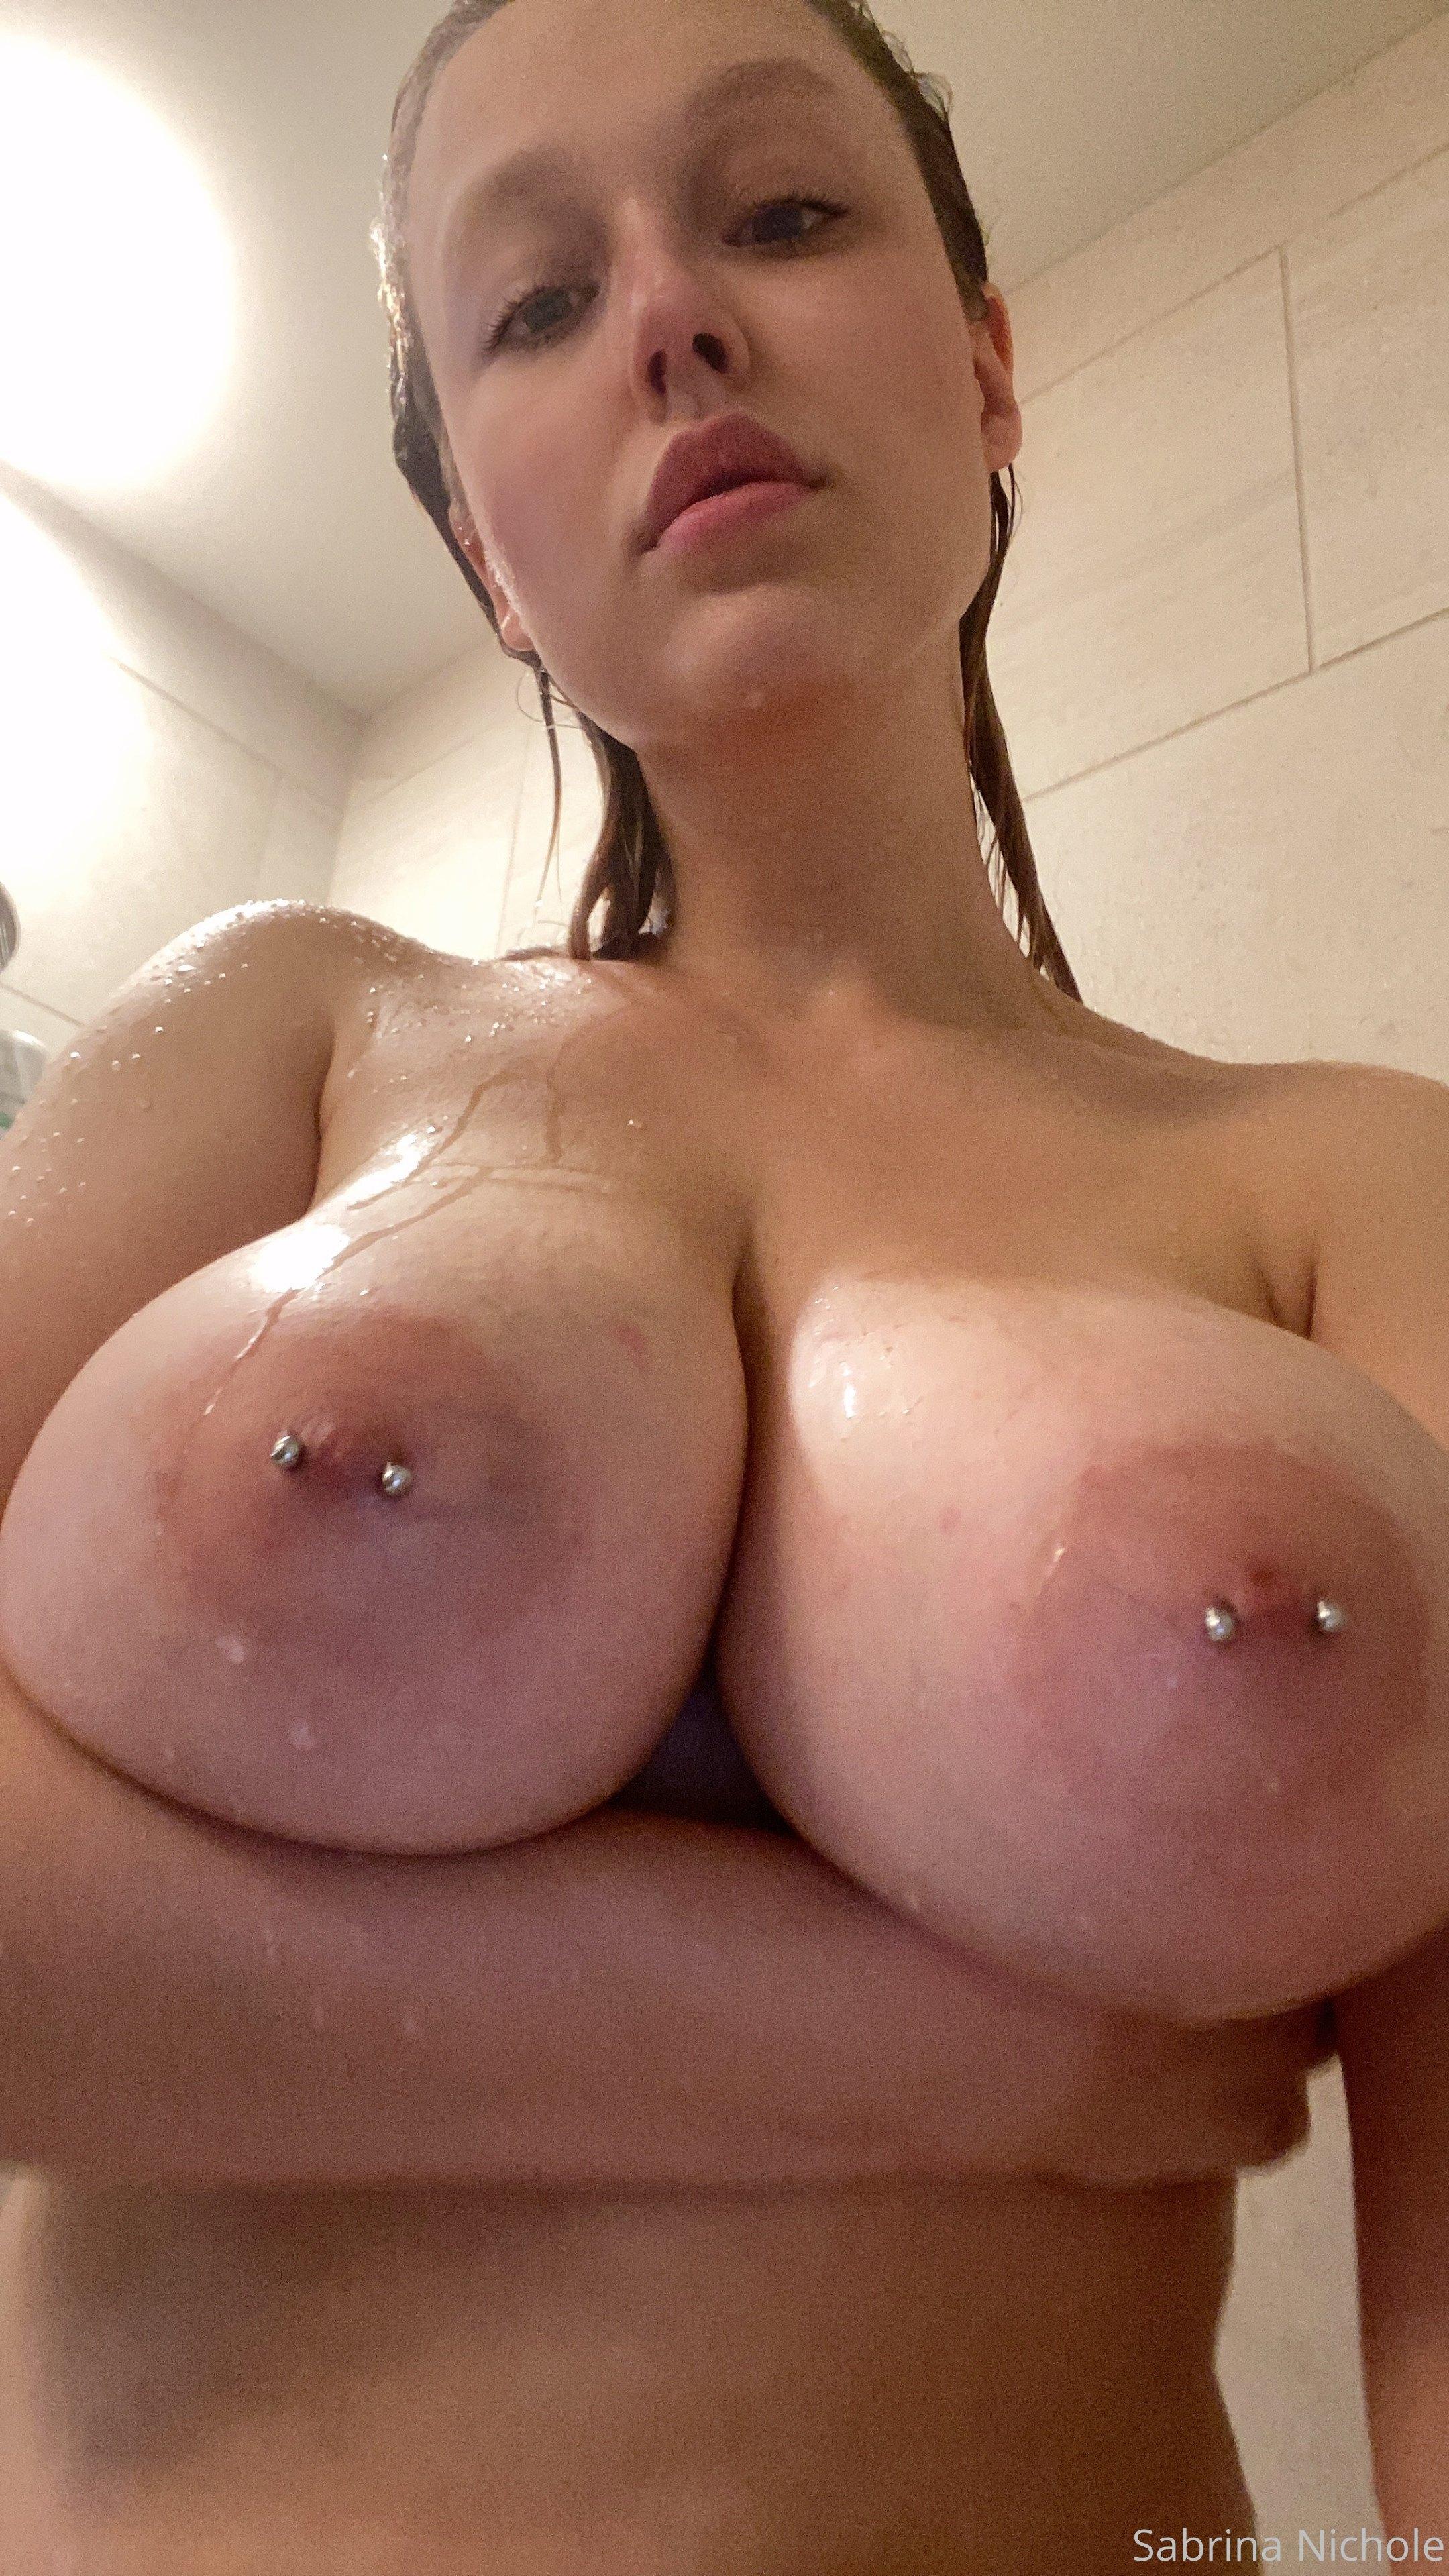 Sabrina Nichole 0047